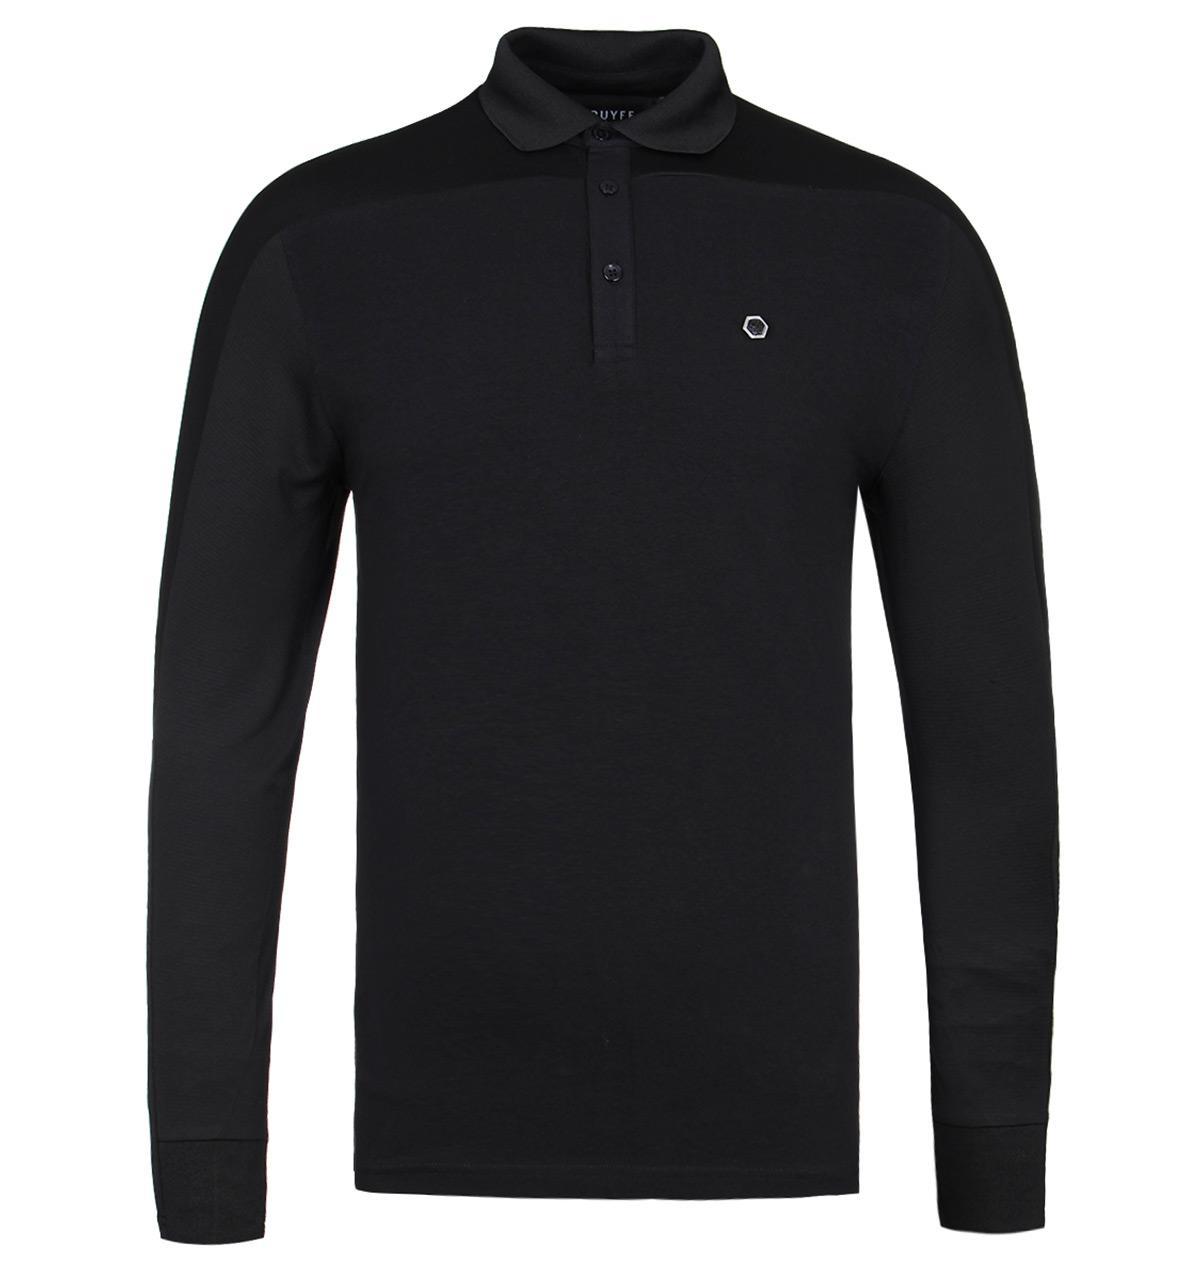 ac5e9a205 Cruyff Clothing Cruyff Amsterdam Black Long Sleeve Polo Shirt in ...